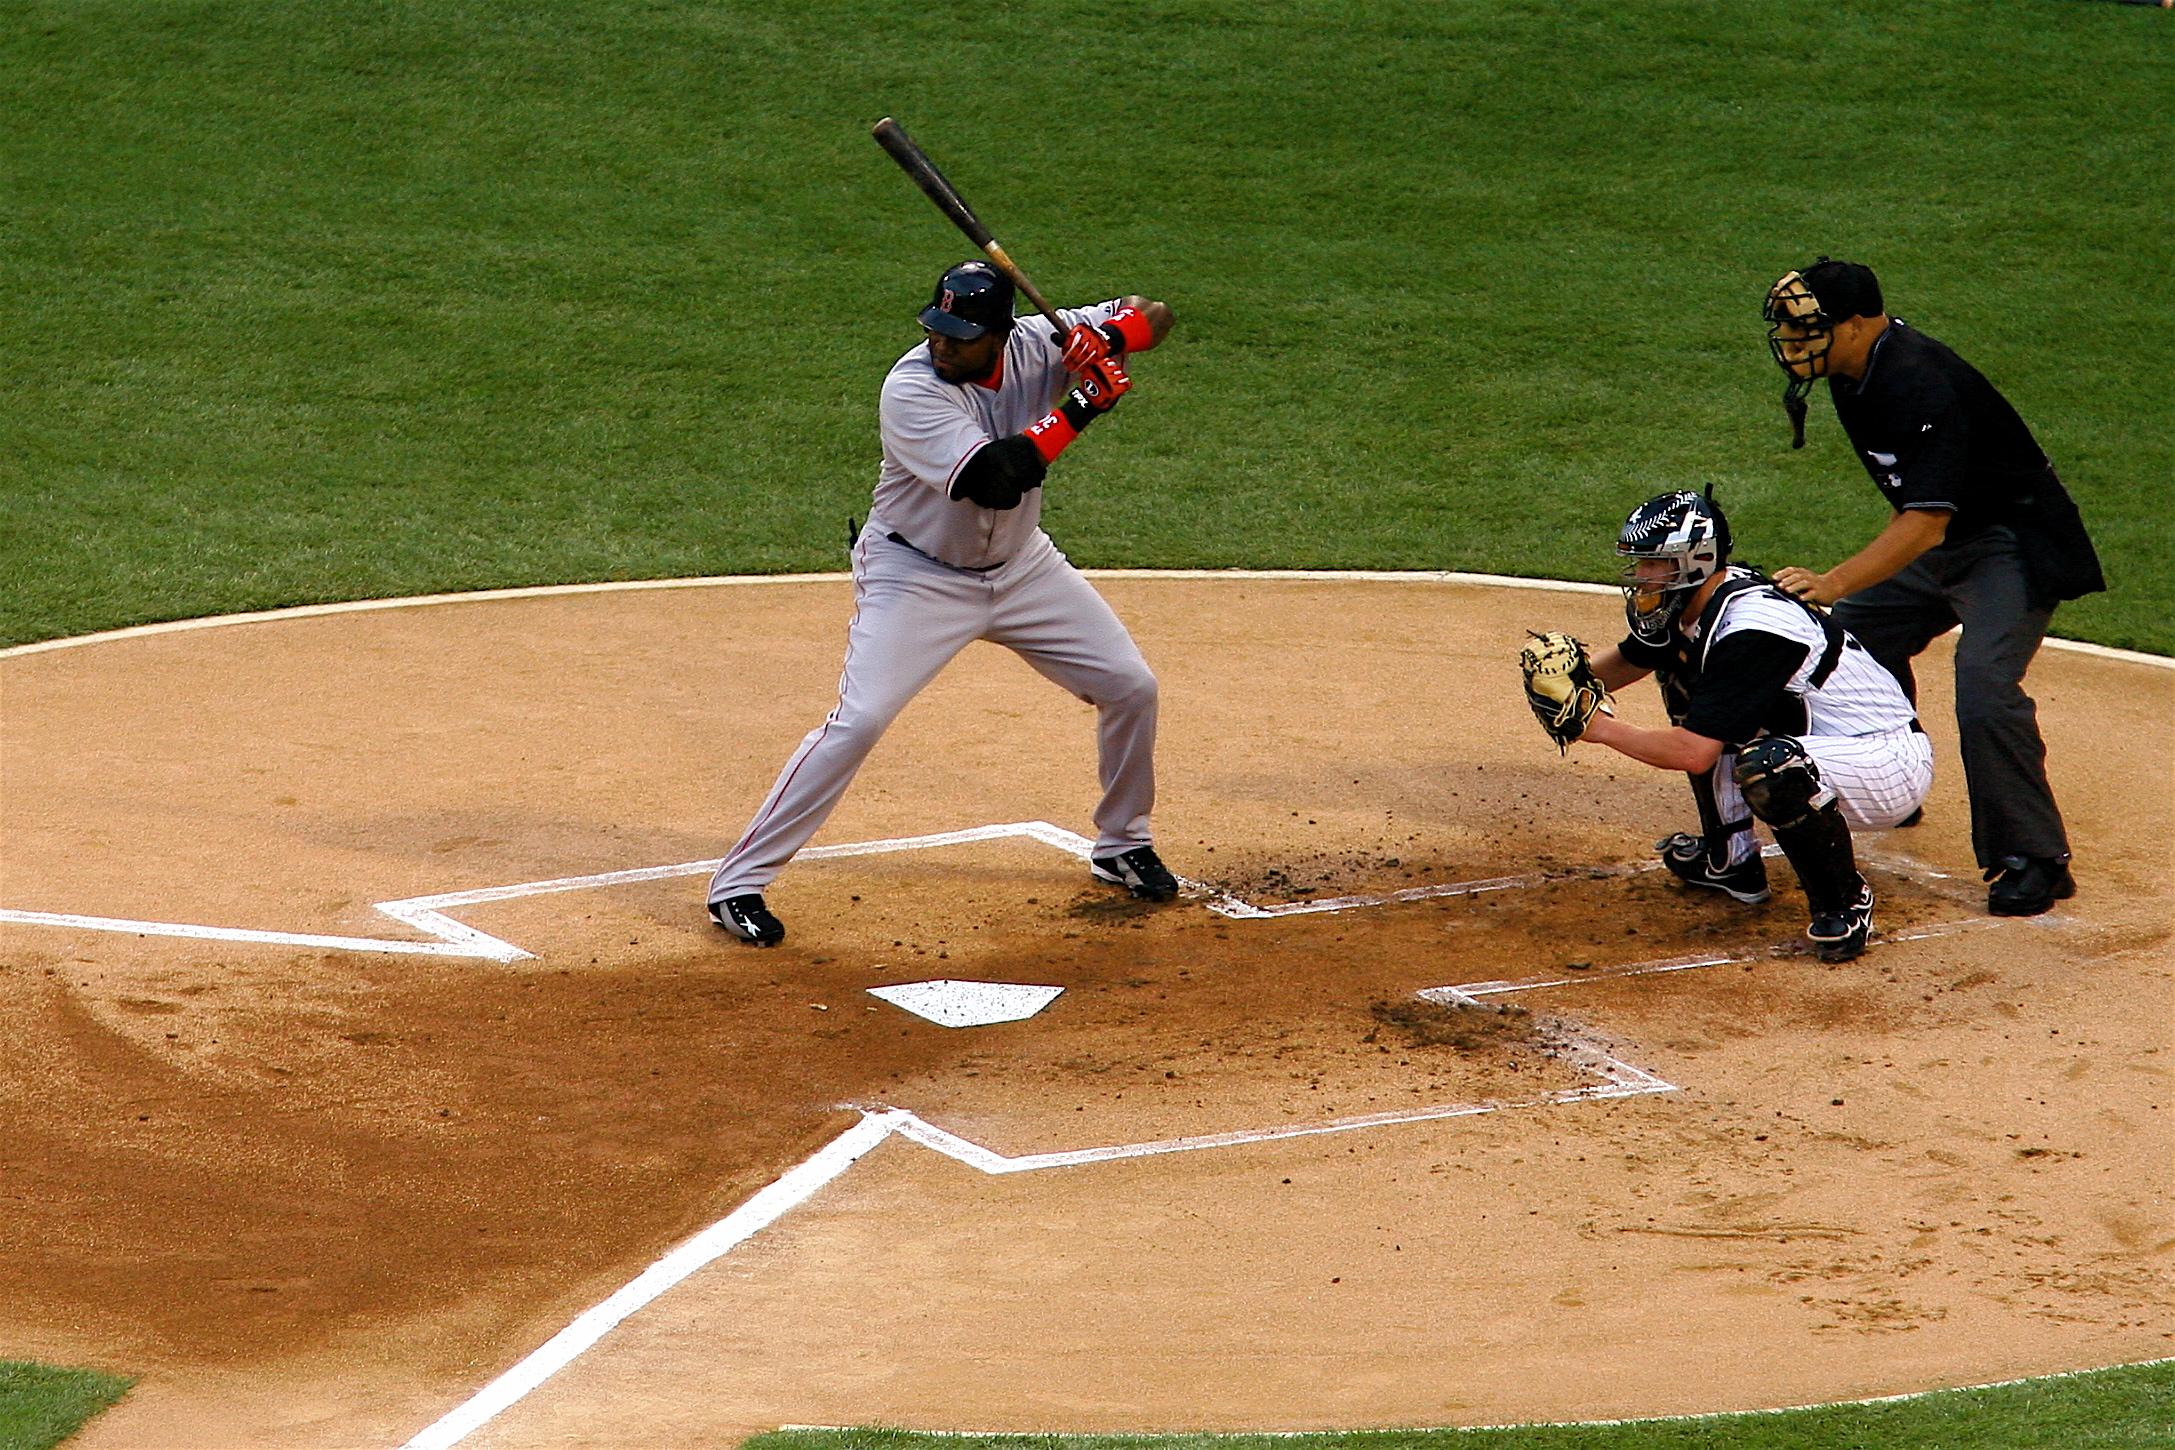 Baseball Backgrounds on Wallpapers Vista